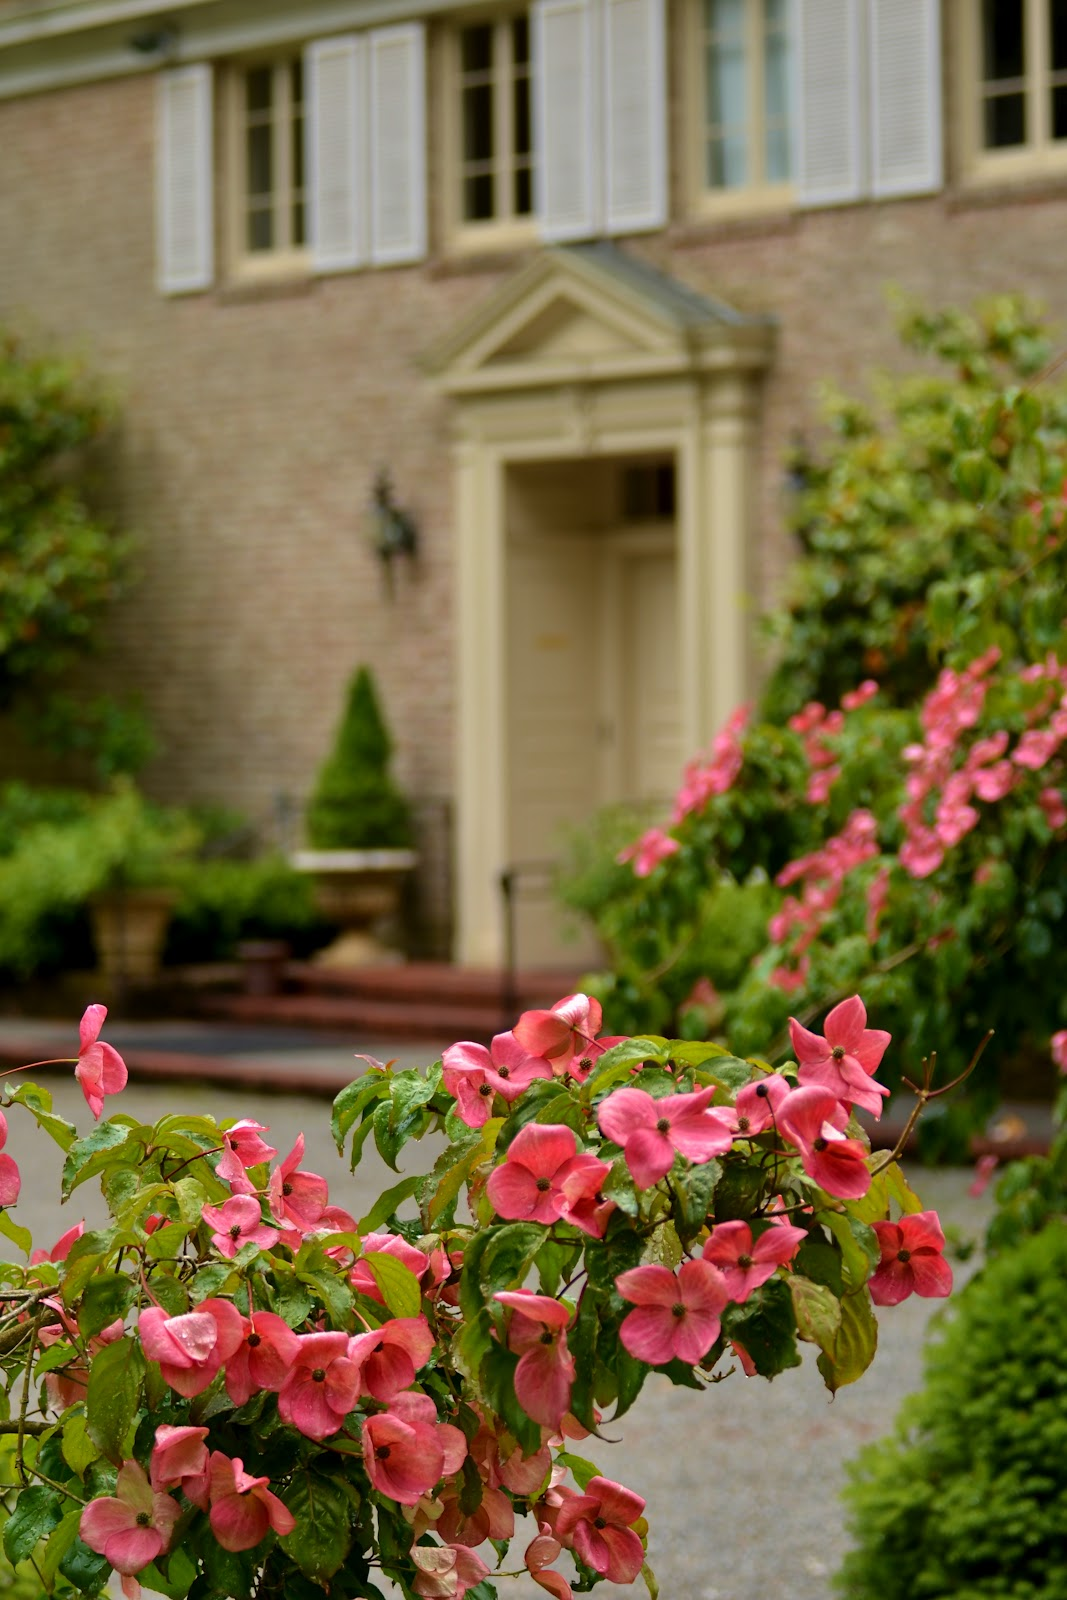 Bonnie King Photography: As I See It: Lakewold Gardens - Tacoma, WA